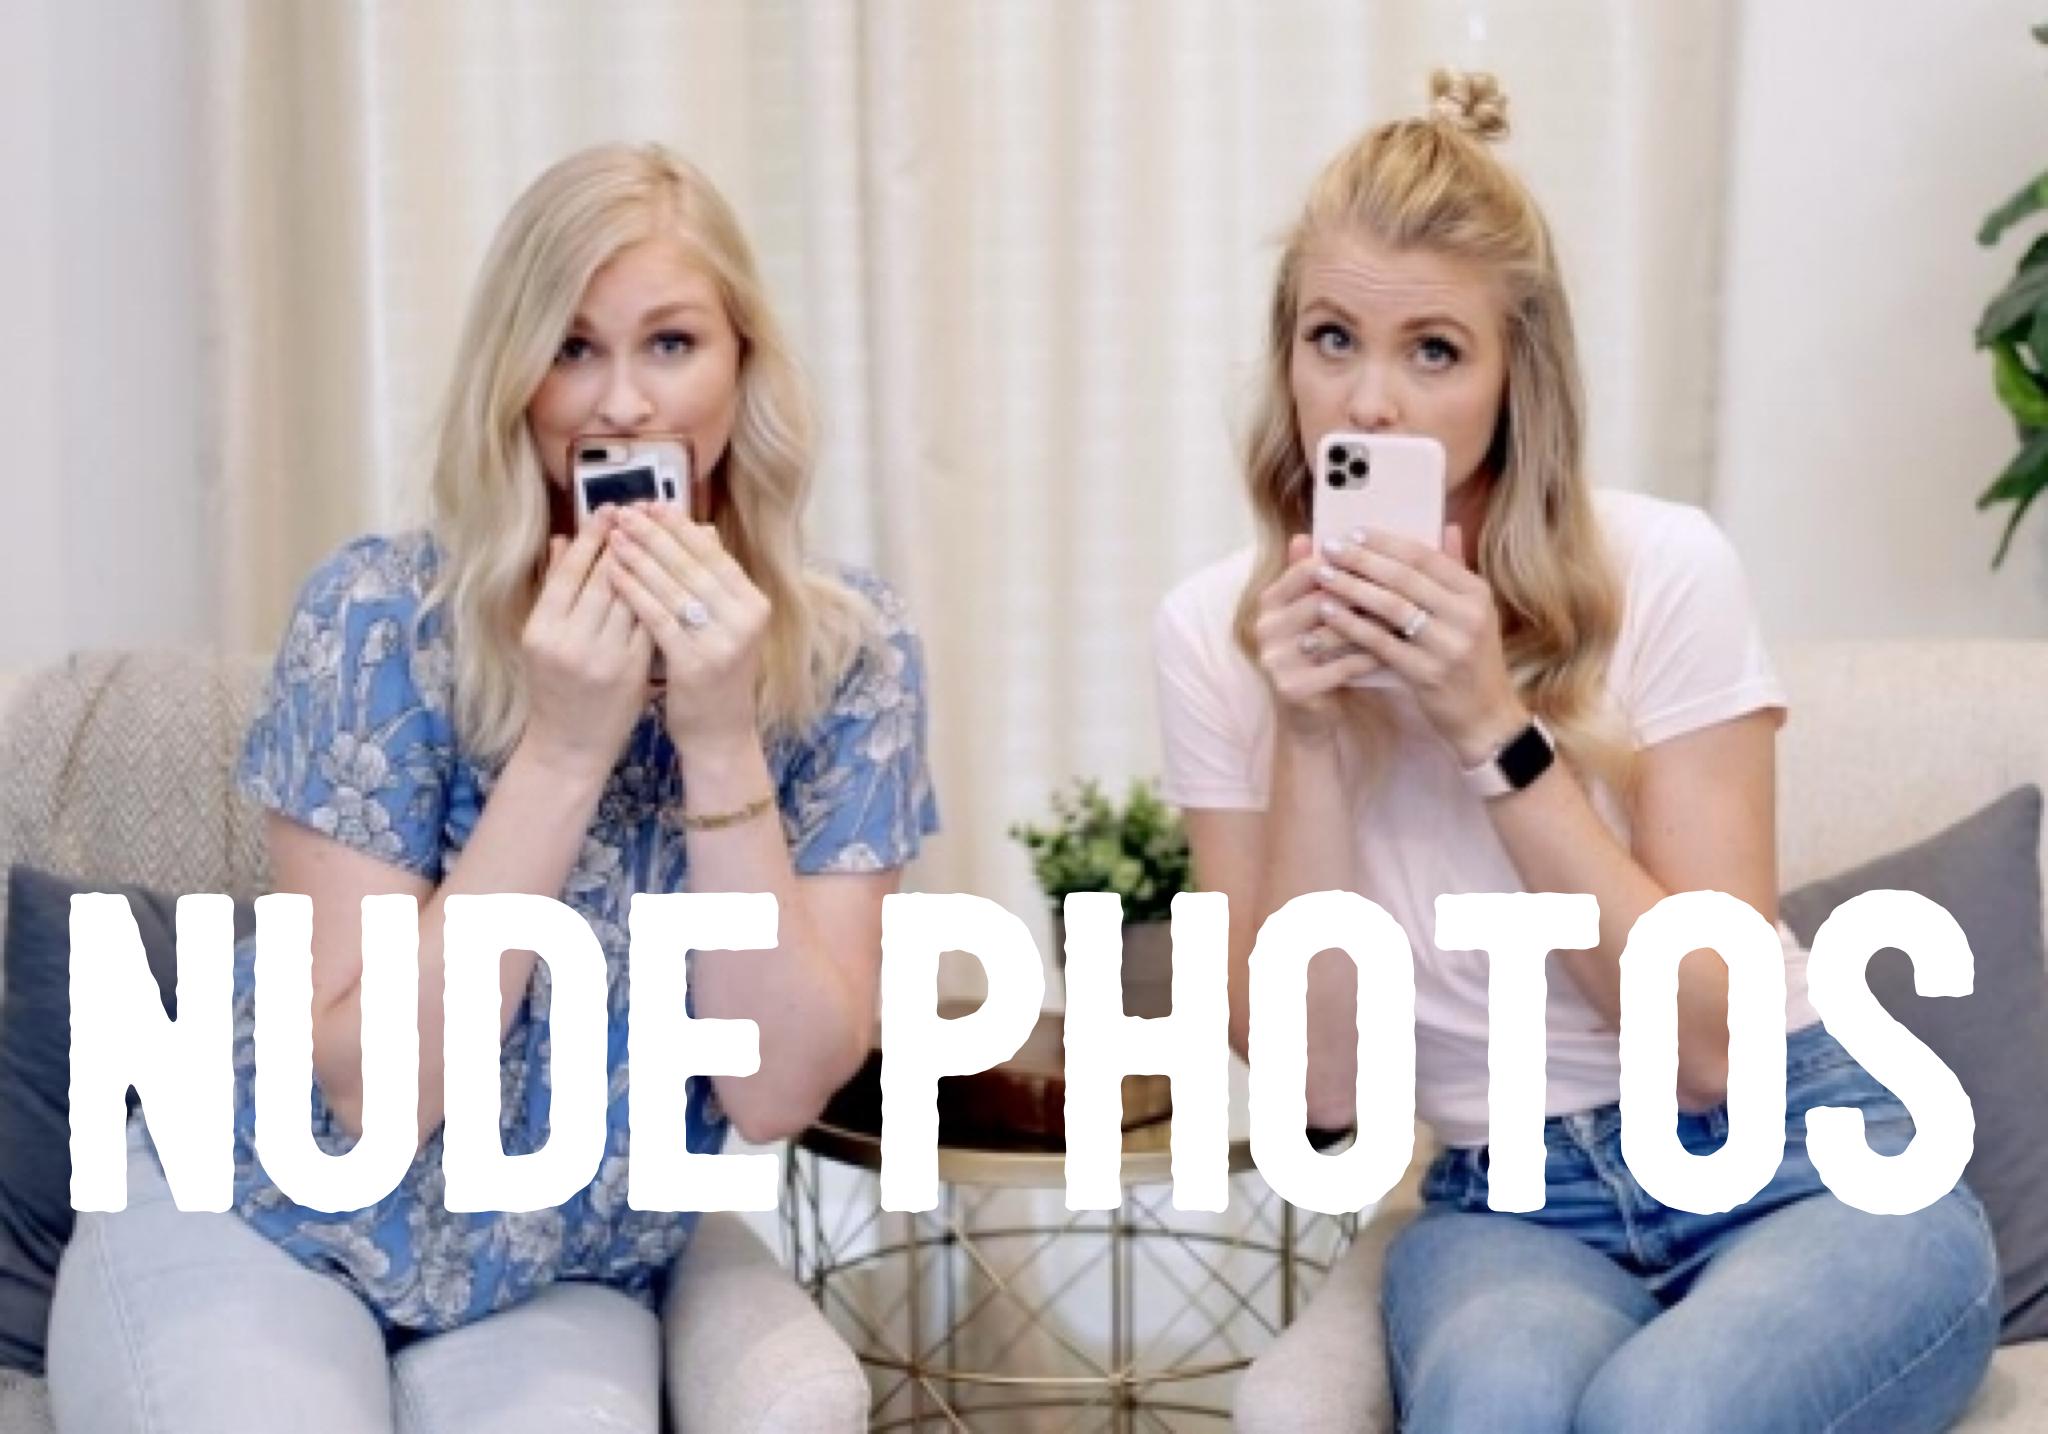 Should Christian Girls Send Nude Photos?